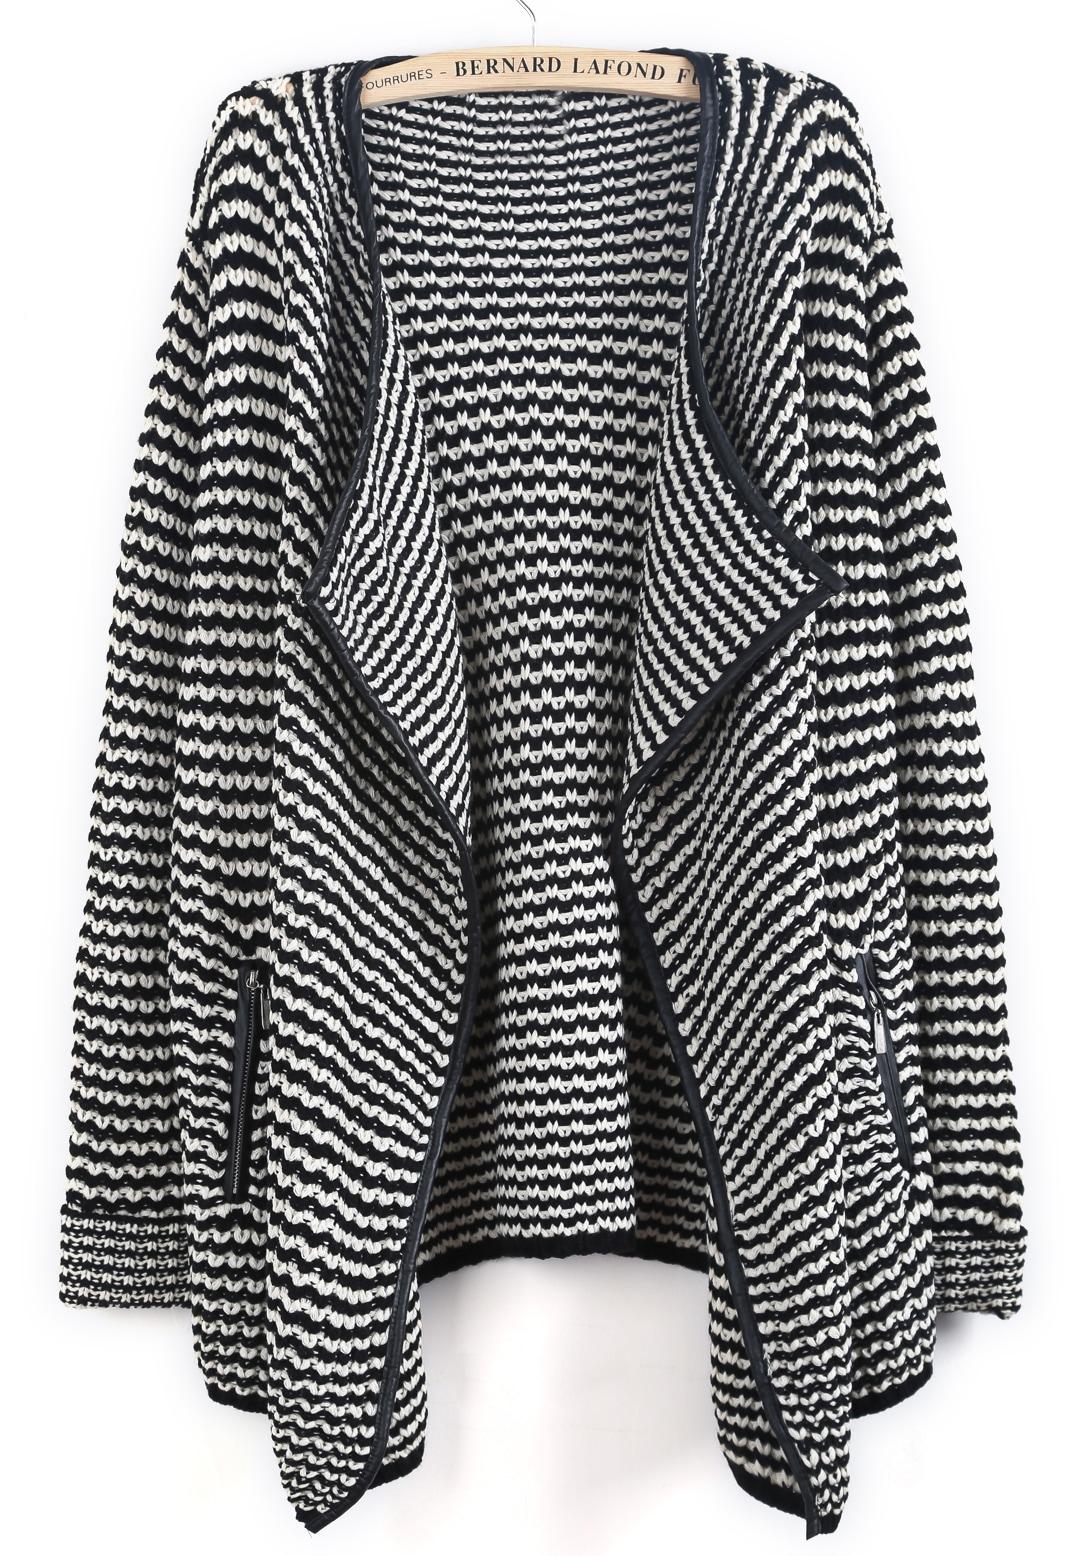 Black White Striped Contrast PU Leather Cardigan -SheIn(Sheinside)